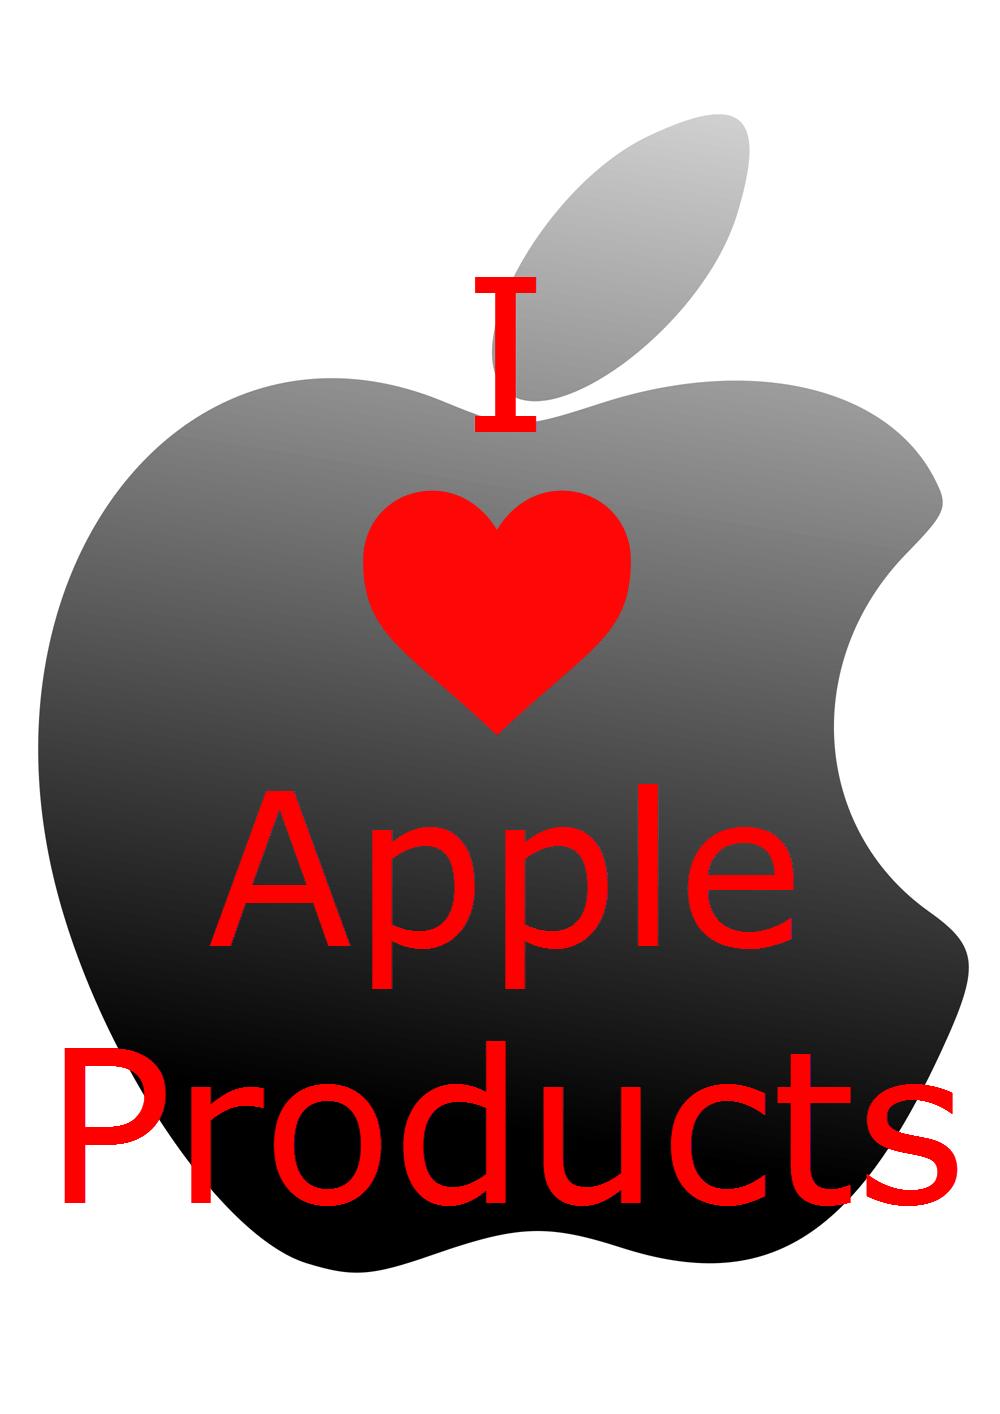 Apple Products.jpg